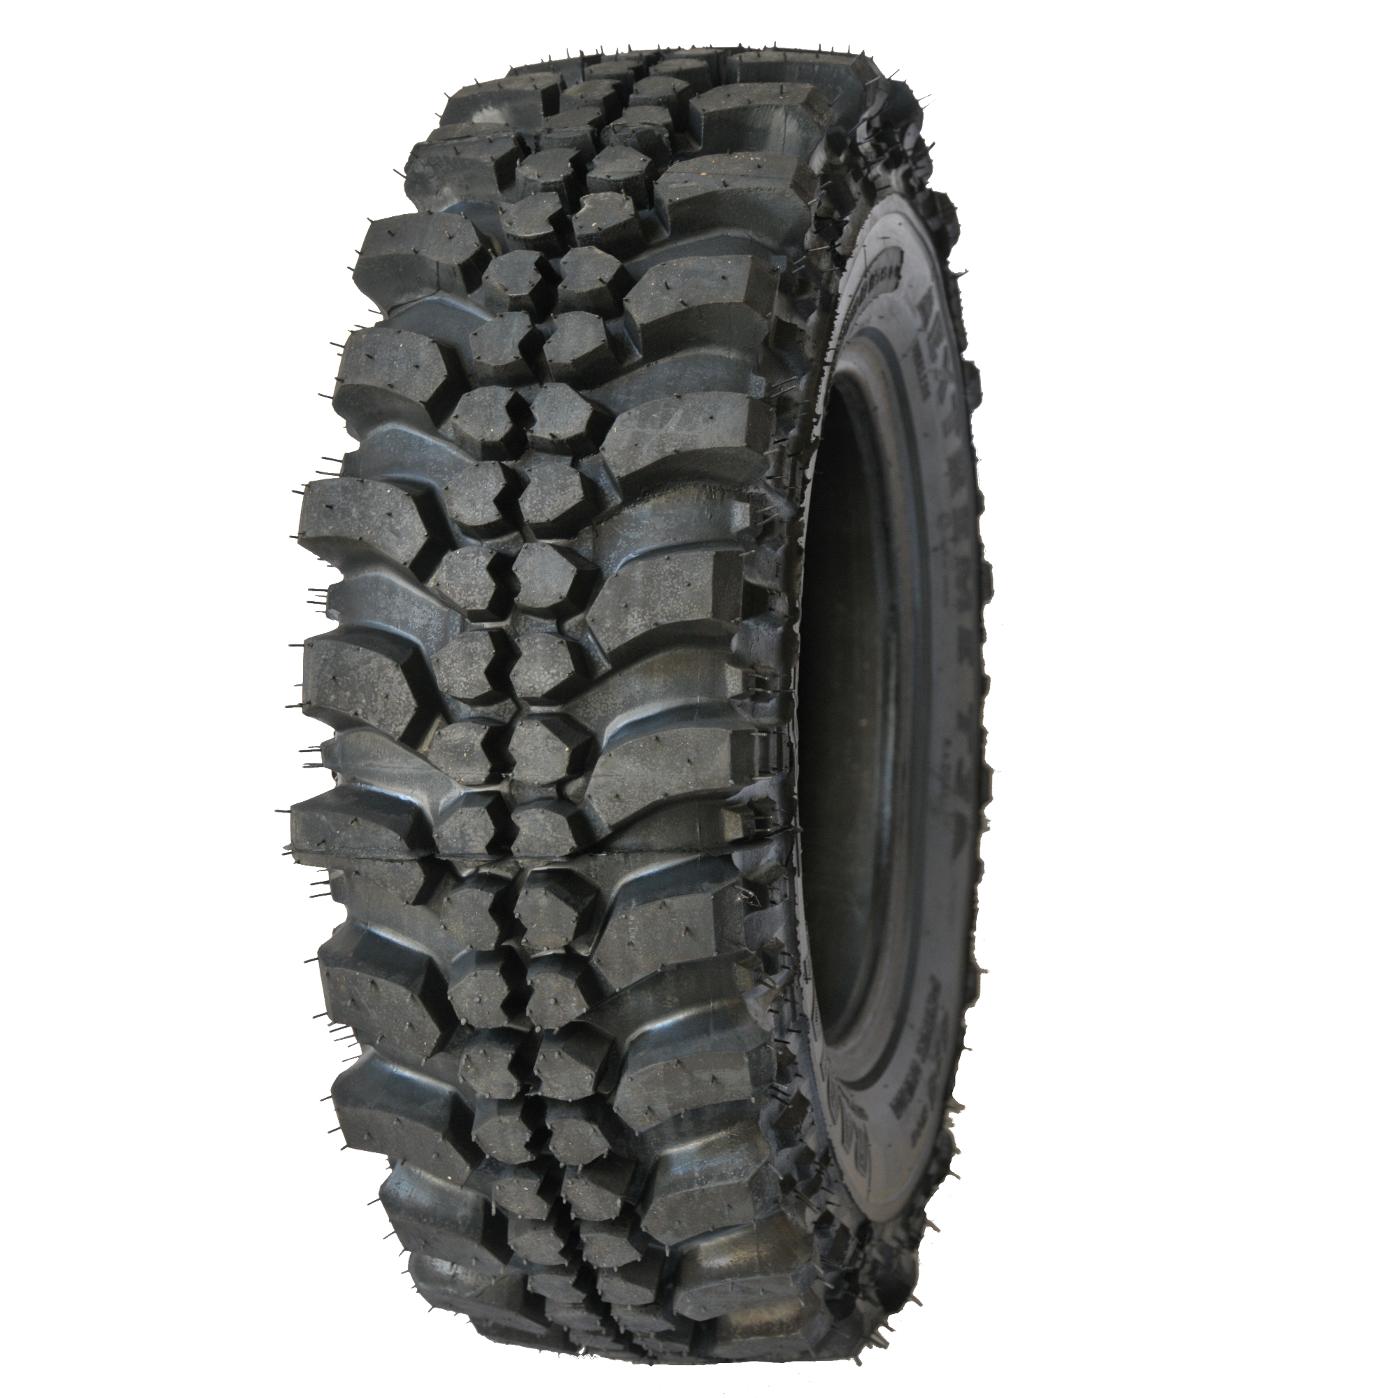 Best Off Road Tires >> Pneus Ovada 4x4 Tires Extreme T3 215 80 R15